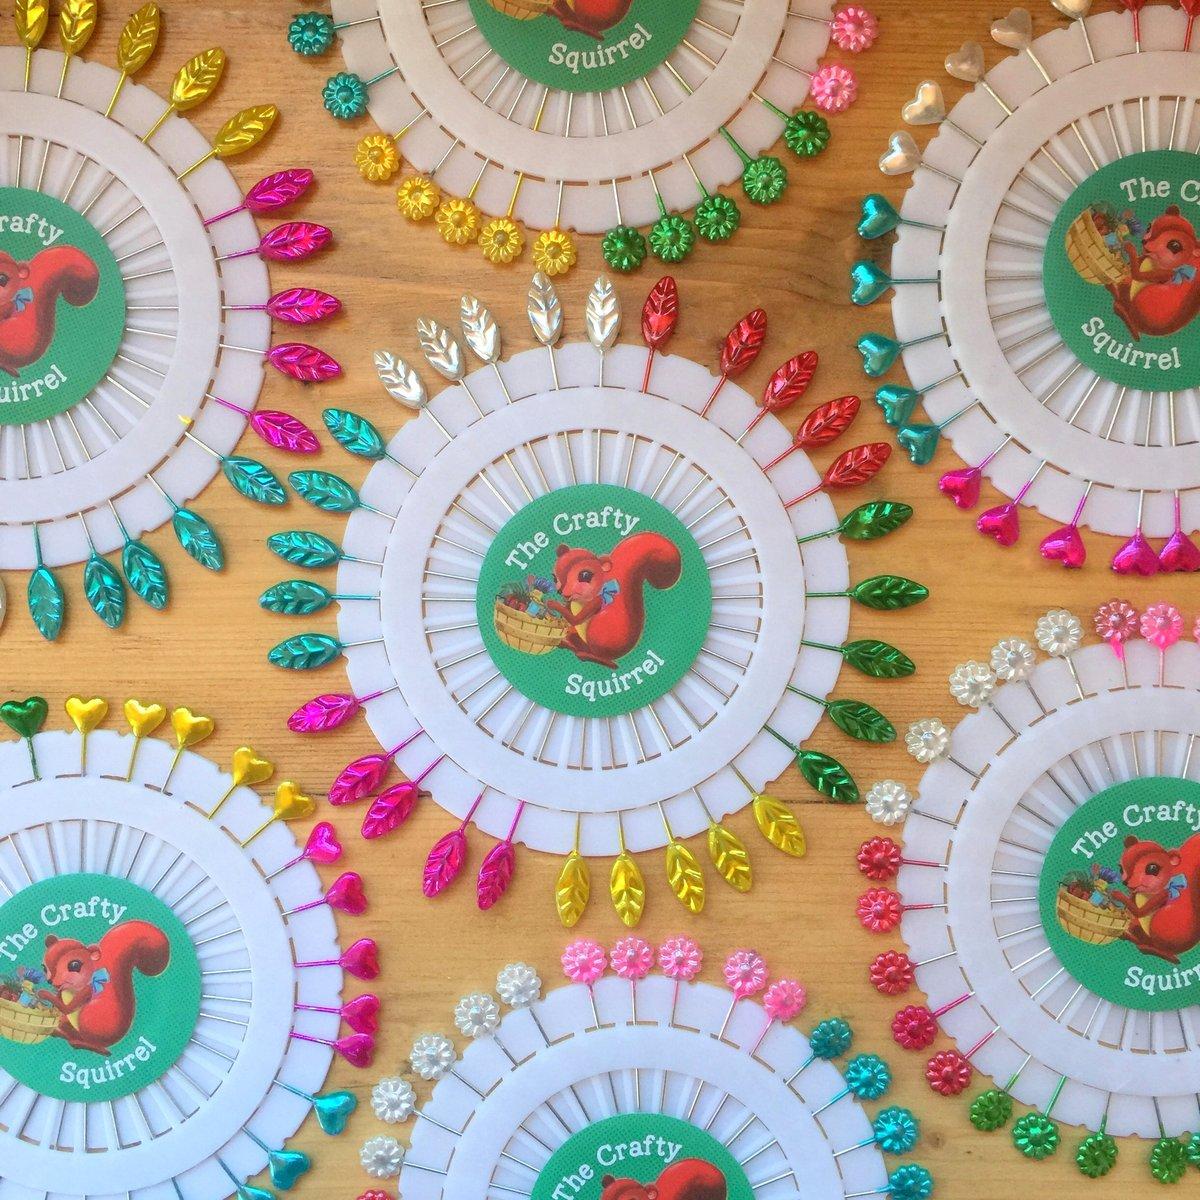 Image of Crafty Squirrel Flower, Heart, Leaf & Star Sewing Pins